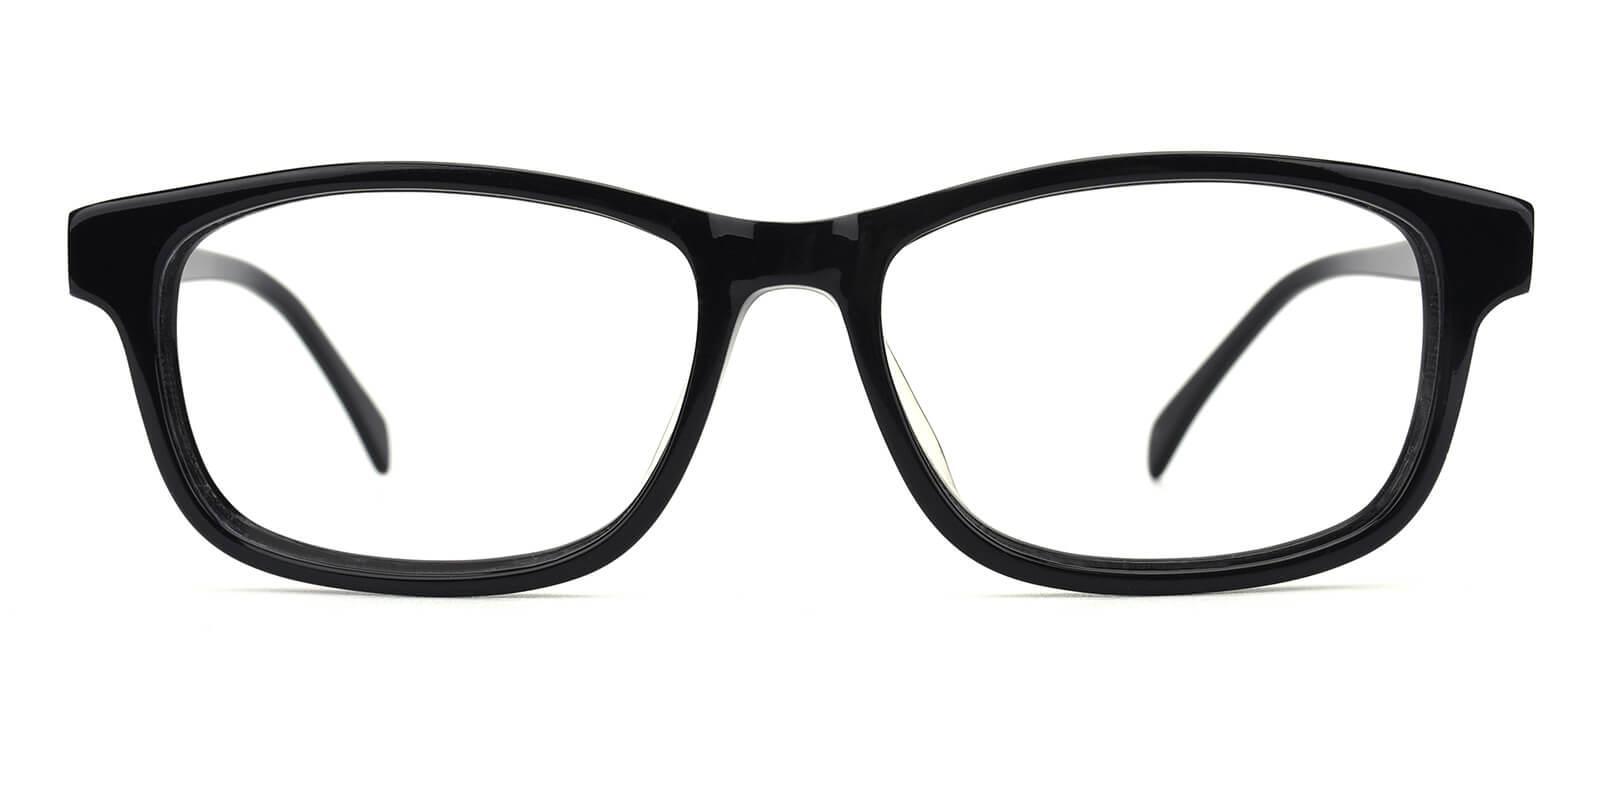 Milo-Black-Rectangle-Acetate-Eyeglasses-detail